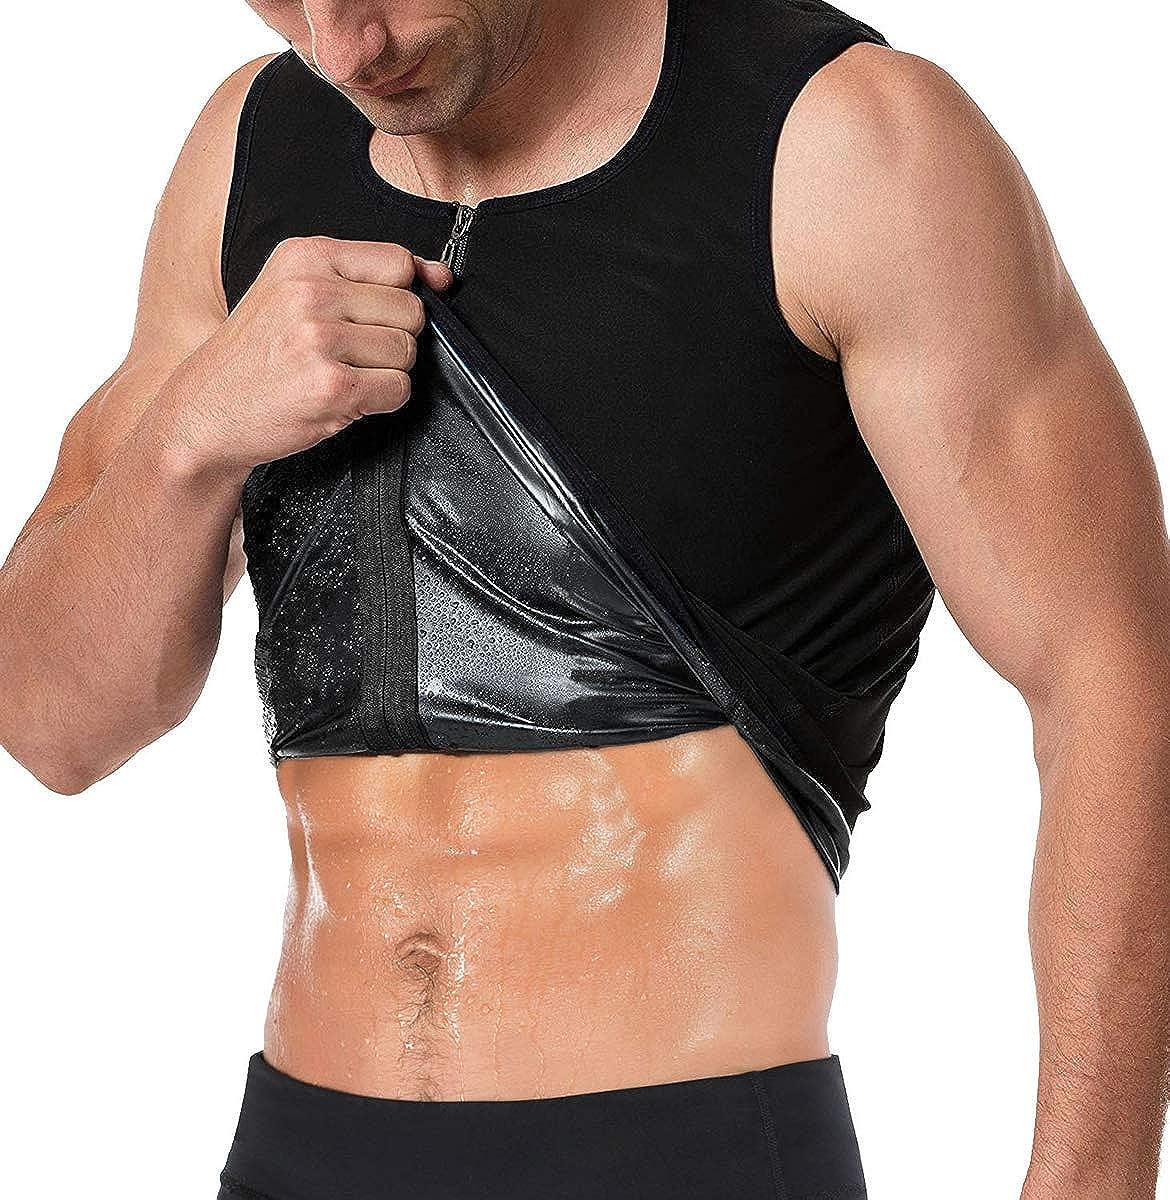 FLORATA Men Waist Trainer Vest Hot Sweat Sauna Suit Corset Body Shaper Zipper Tank Top Workout Shirt : Clothing